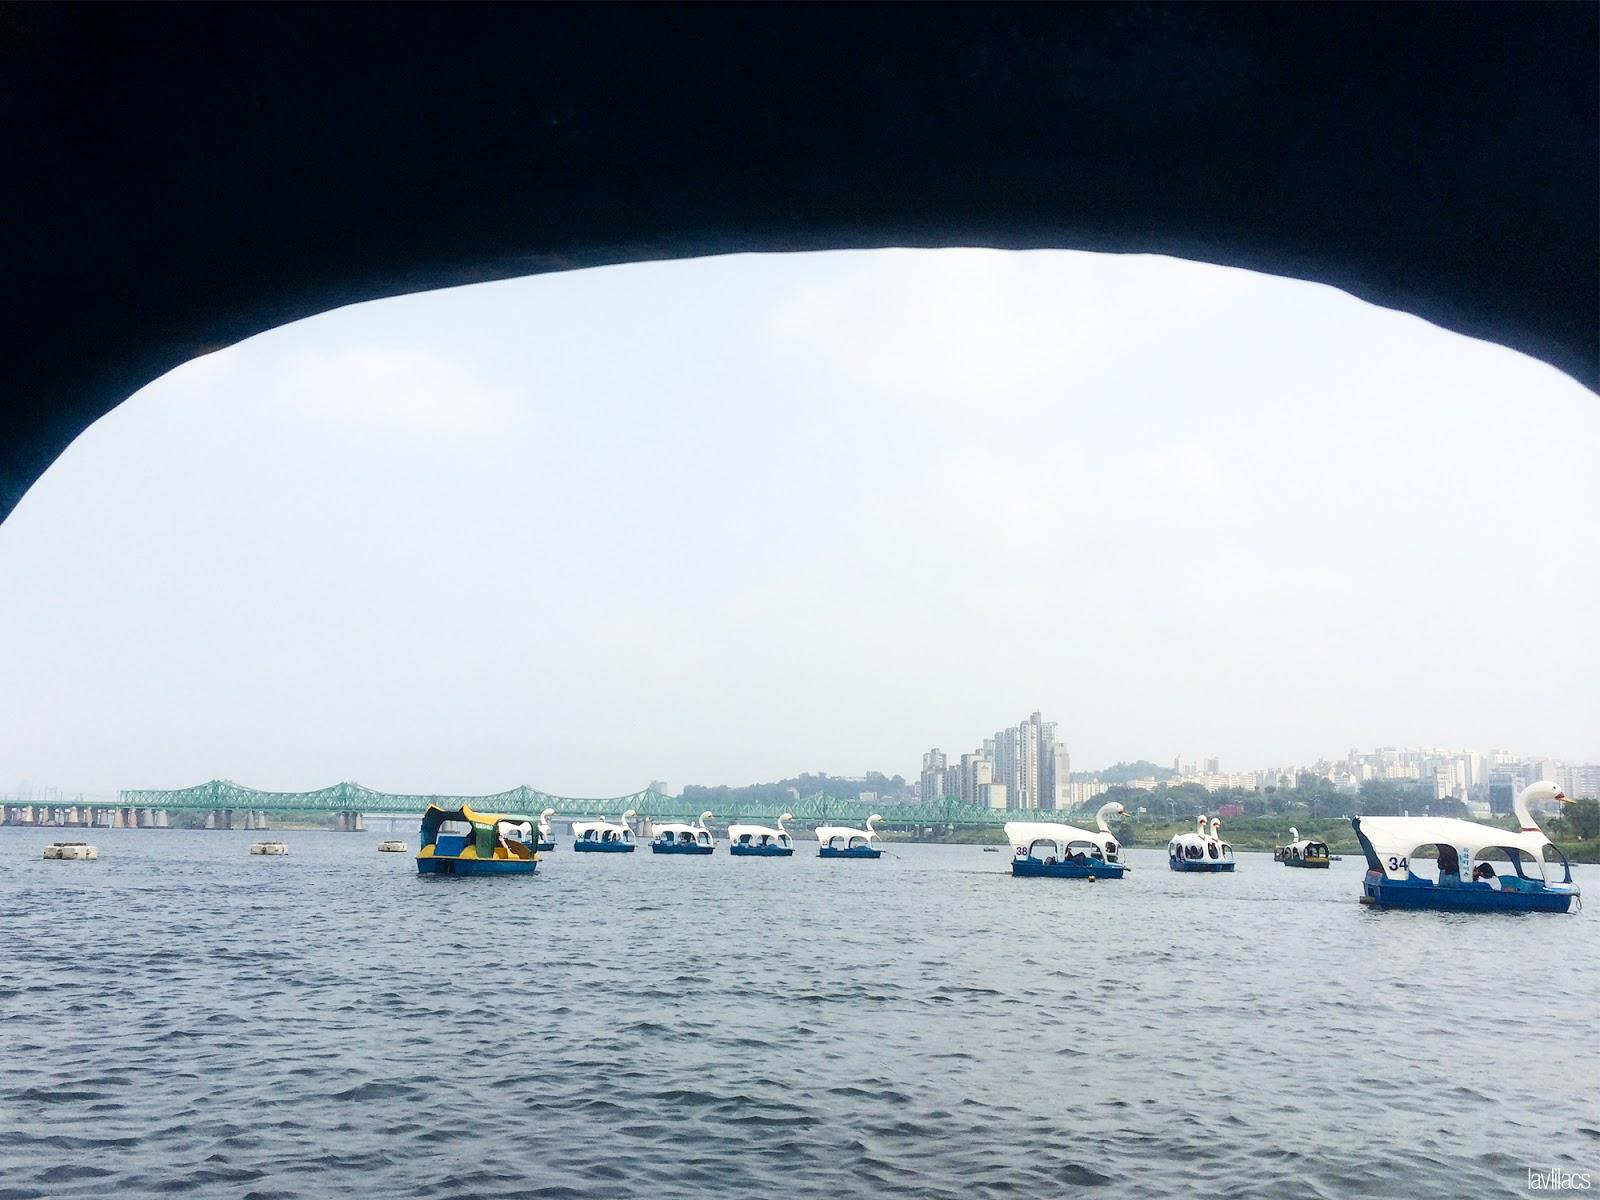 Seoul, Korea - Summer Study Abroad 2014 - Yeouido Park - Han River - swan pedal boats